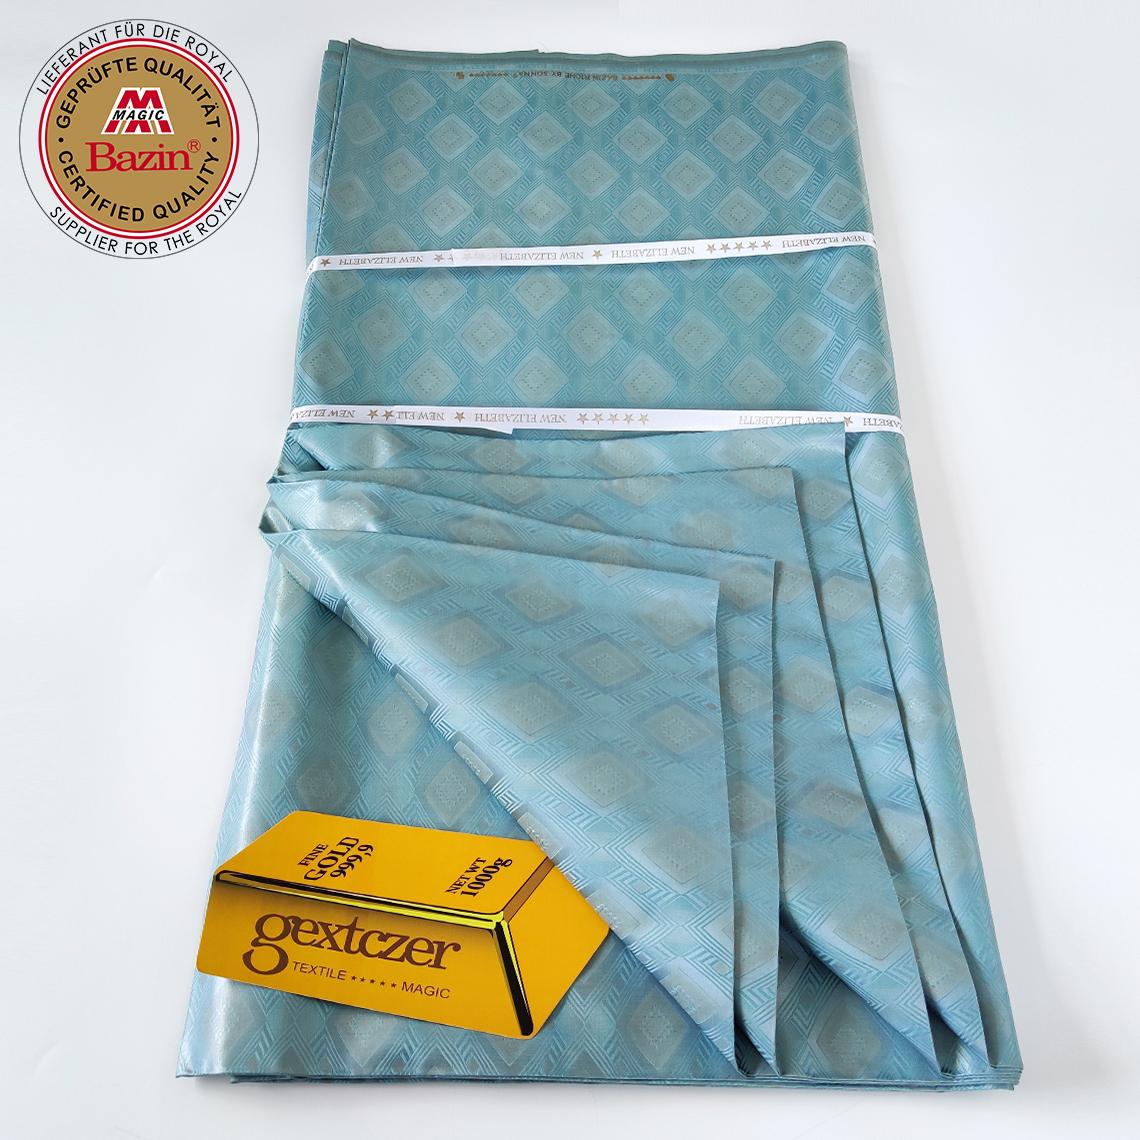 160 CM Bazin Riche Tissu Dentelle African Lace Fabric 2021 Top Quality Gambia Women Wedding Dresses Basin Riche Lace Fabrics